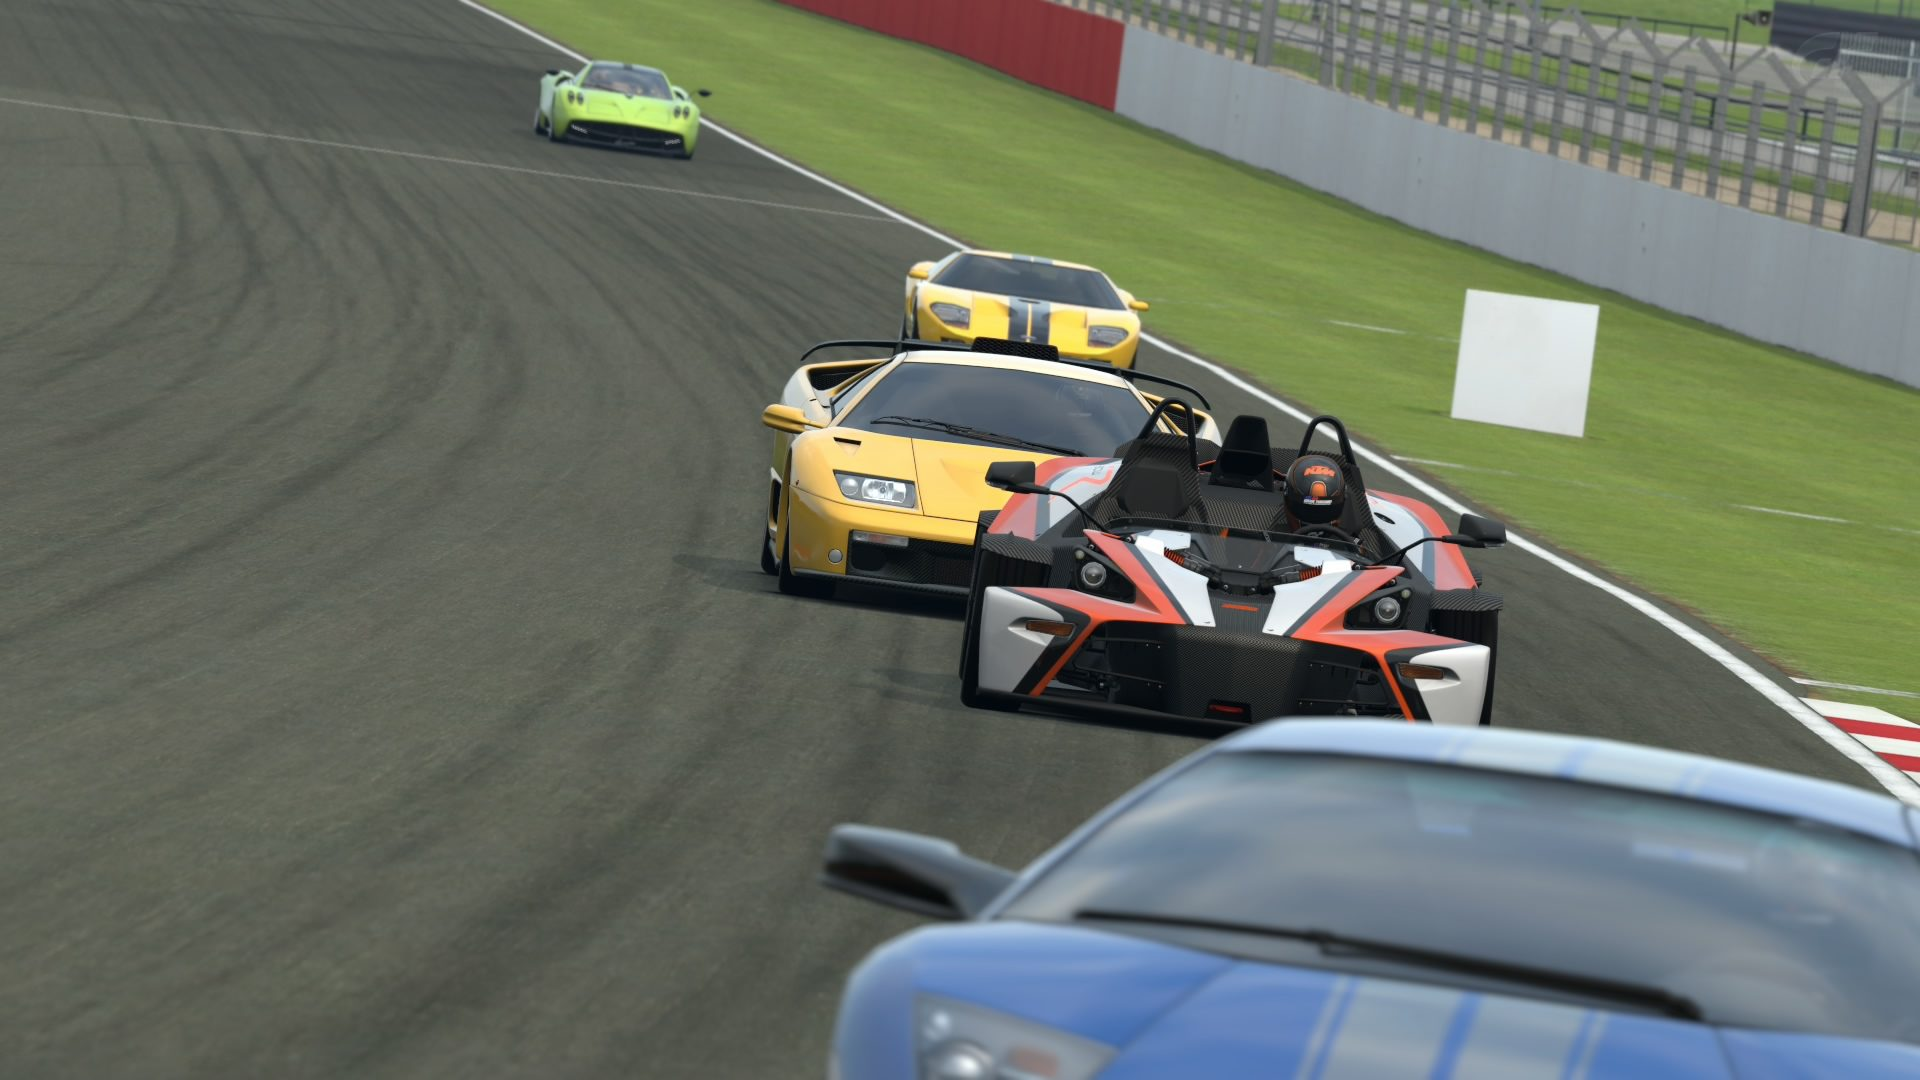 Silverstone International Circuit_7.jpg